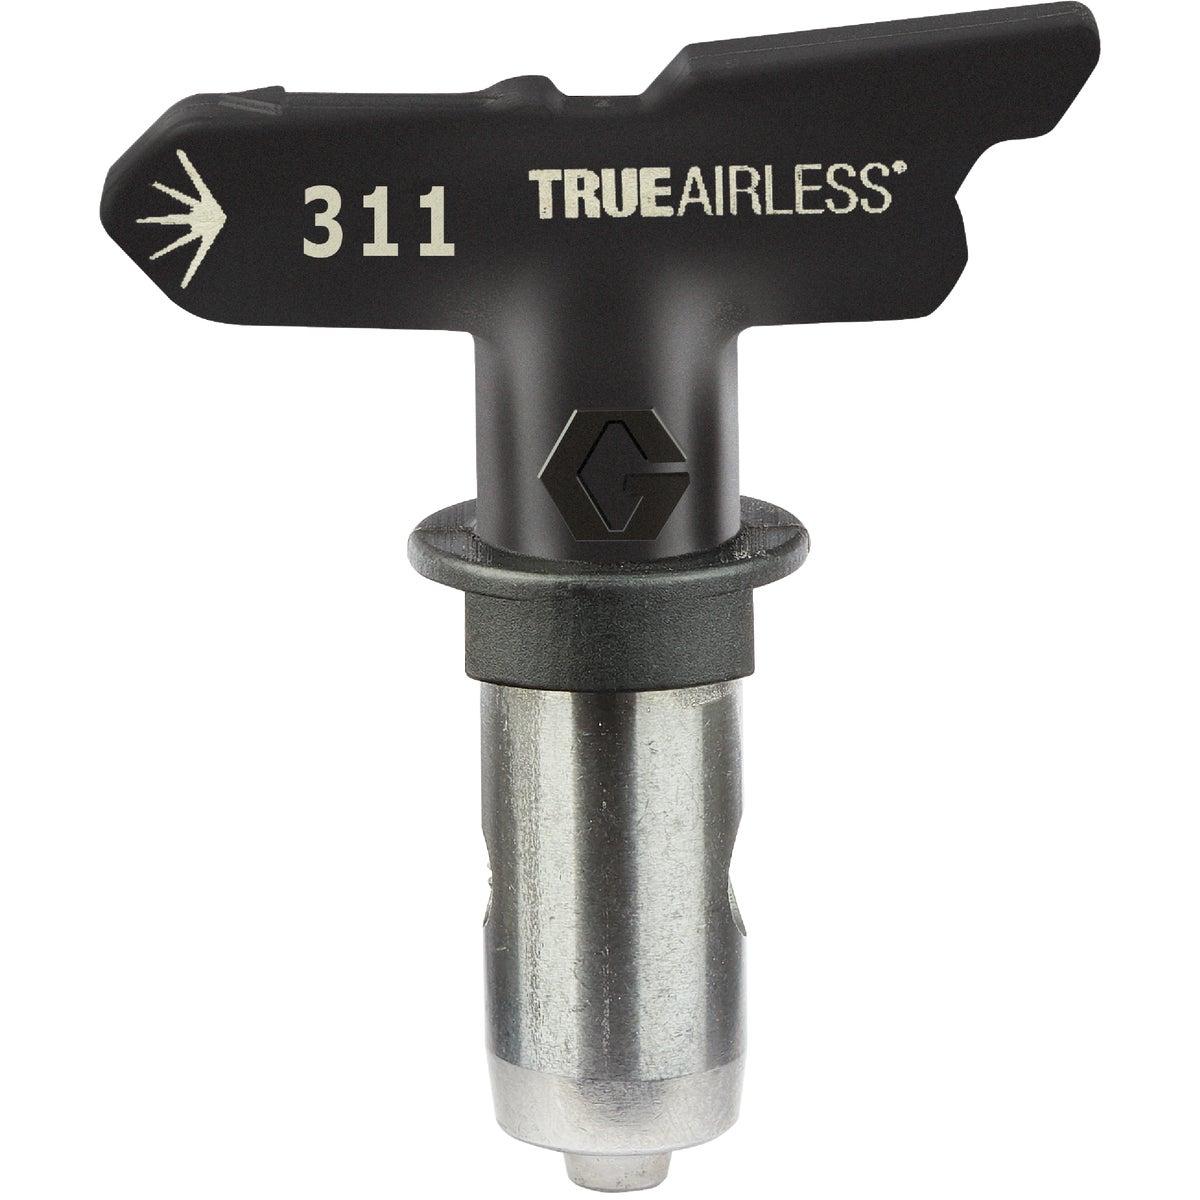 Graco 221311 Airless Spray Tip, RAC IV, 311